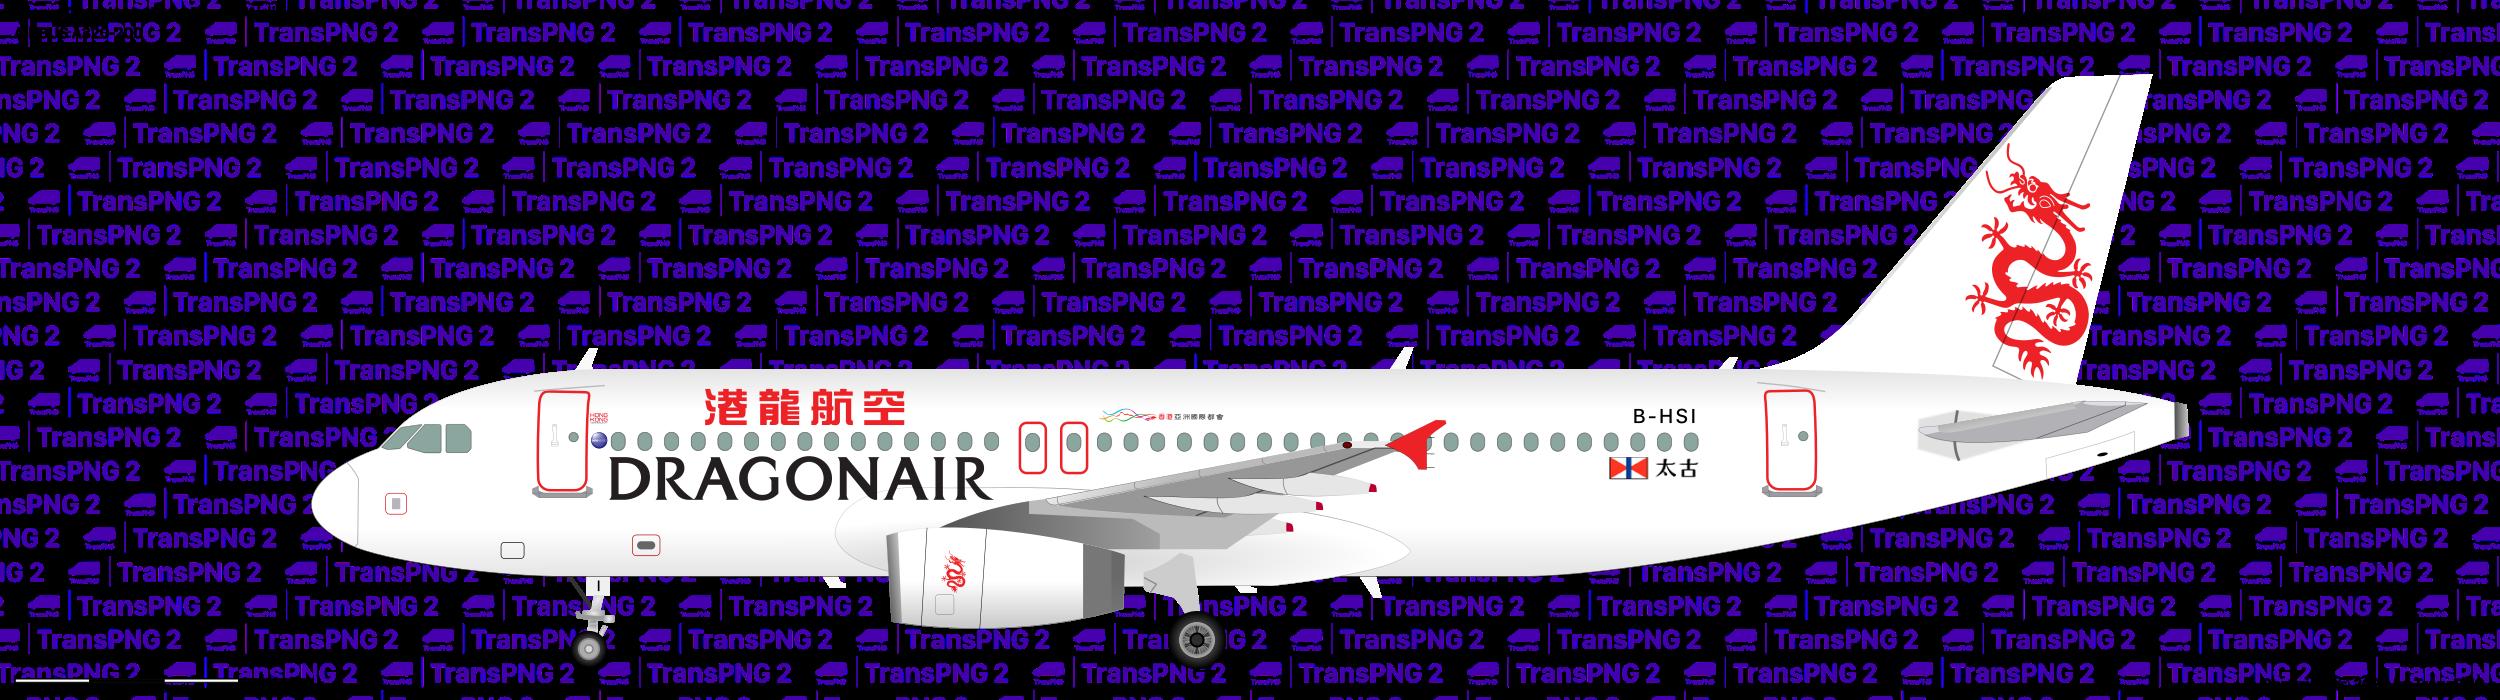 Airplane 25114